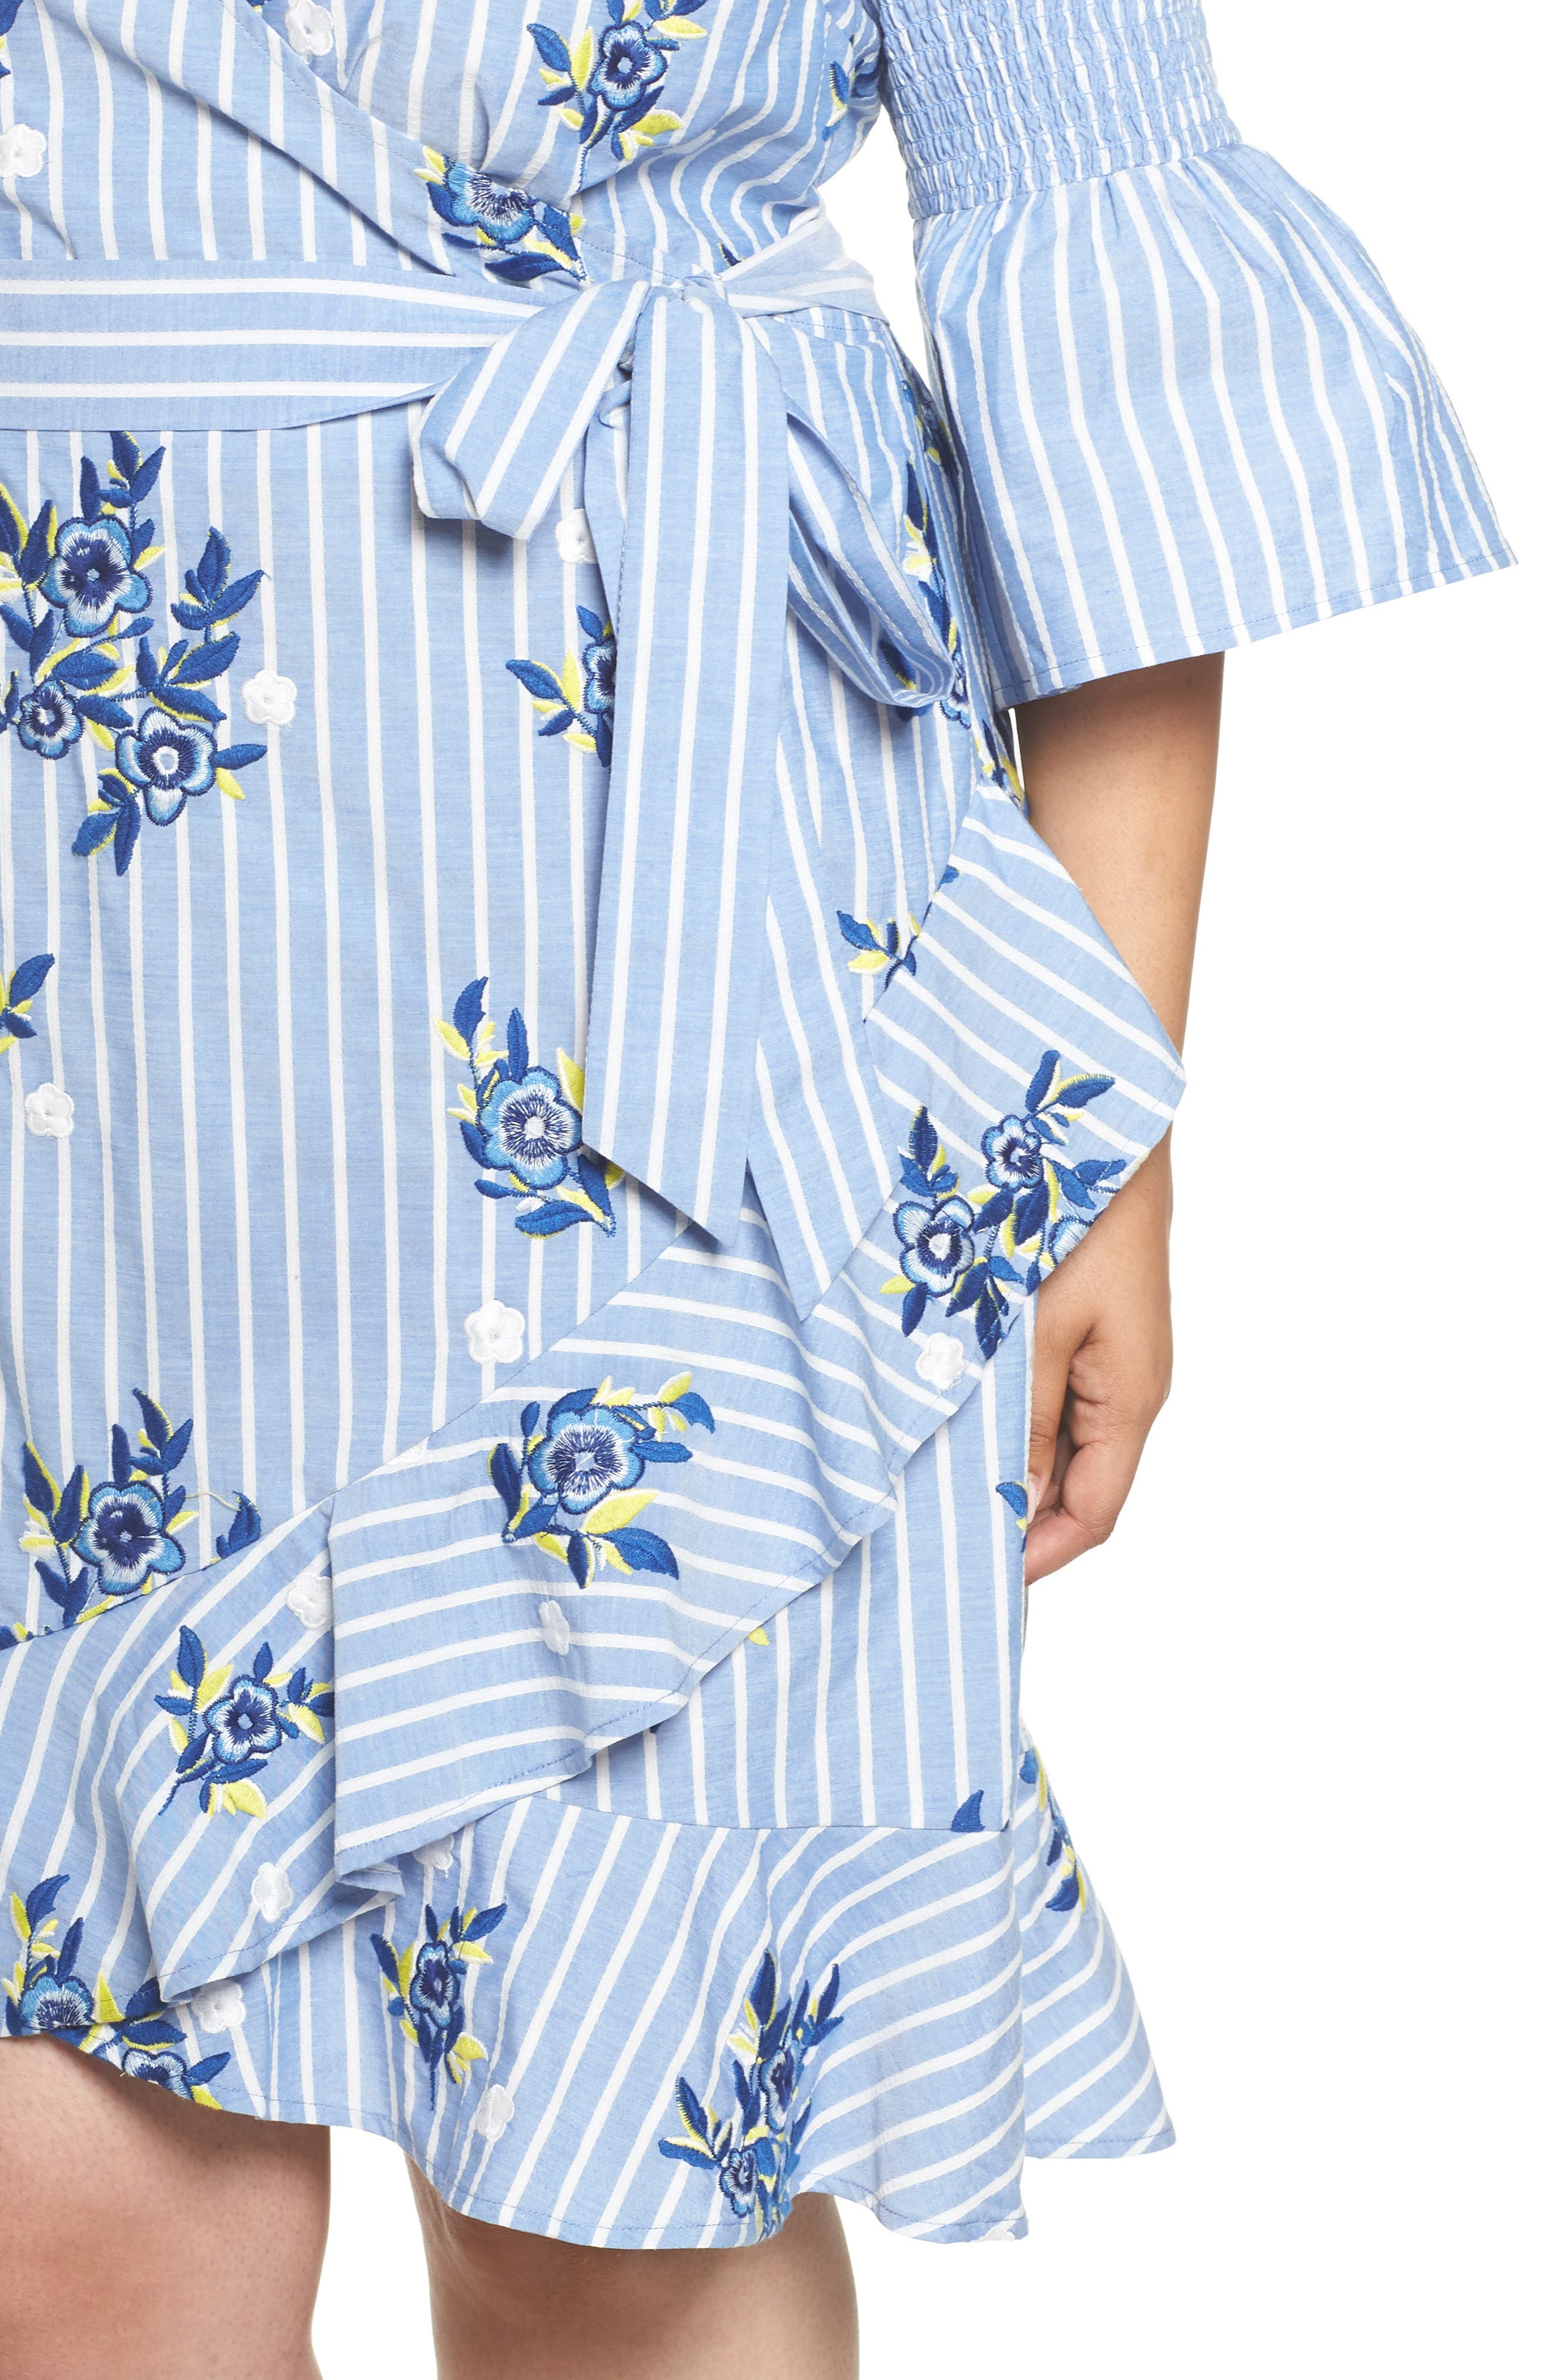 Embroidered Stripe Wrap Dress,                             Alternate thumbnail 4, color,                             Blue/ White